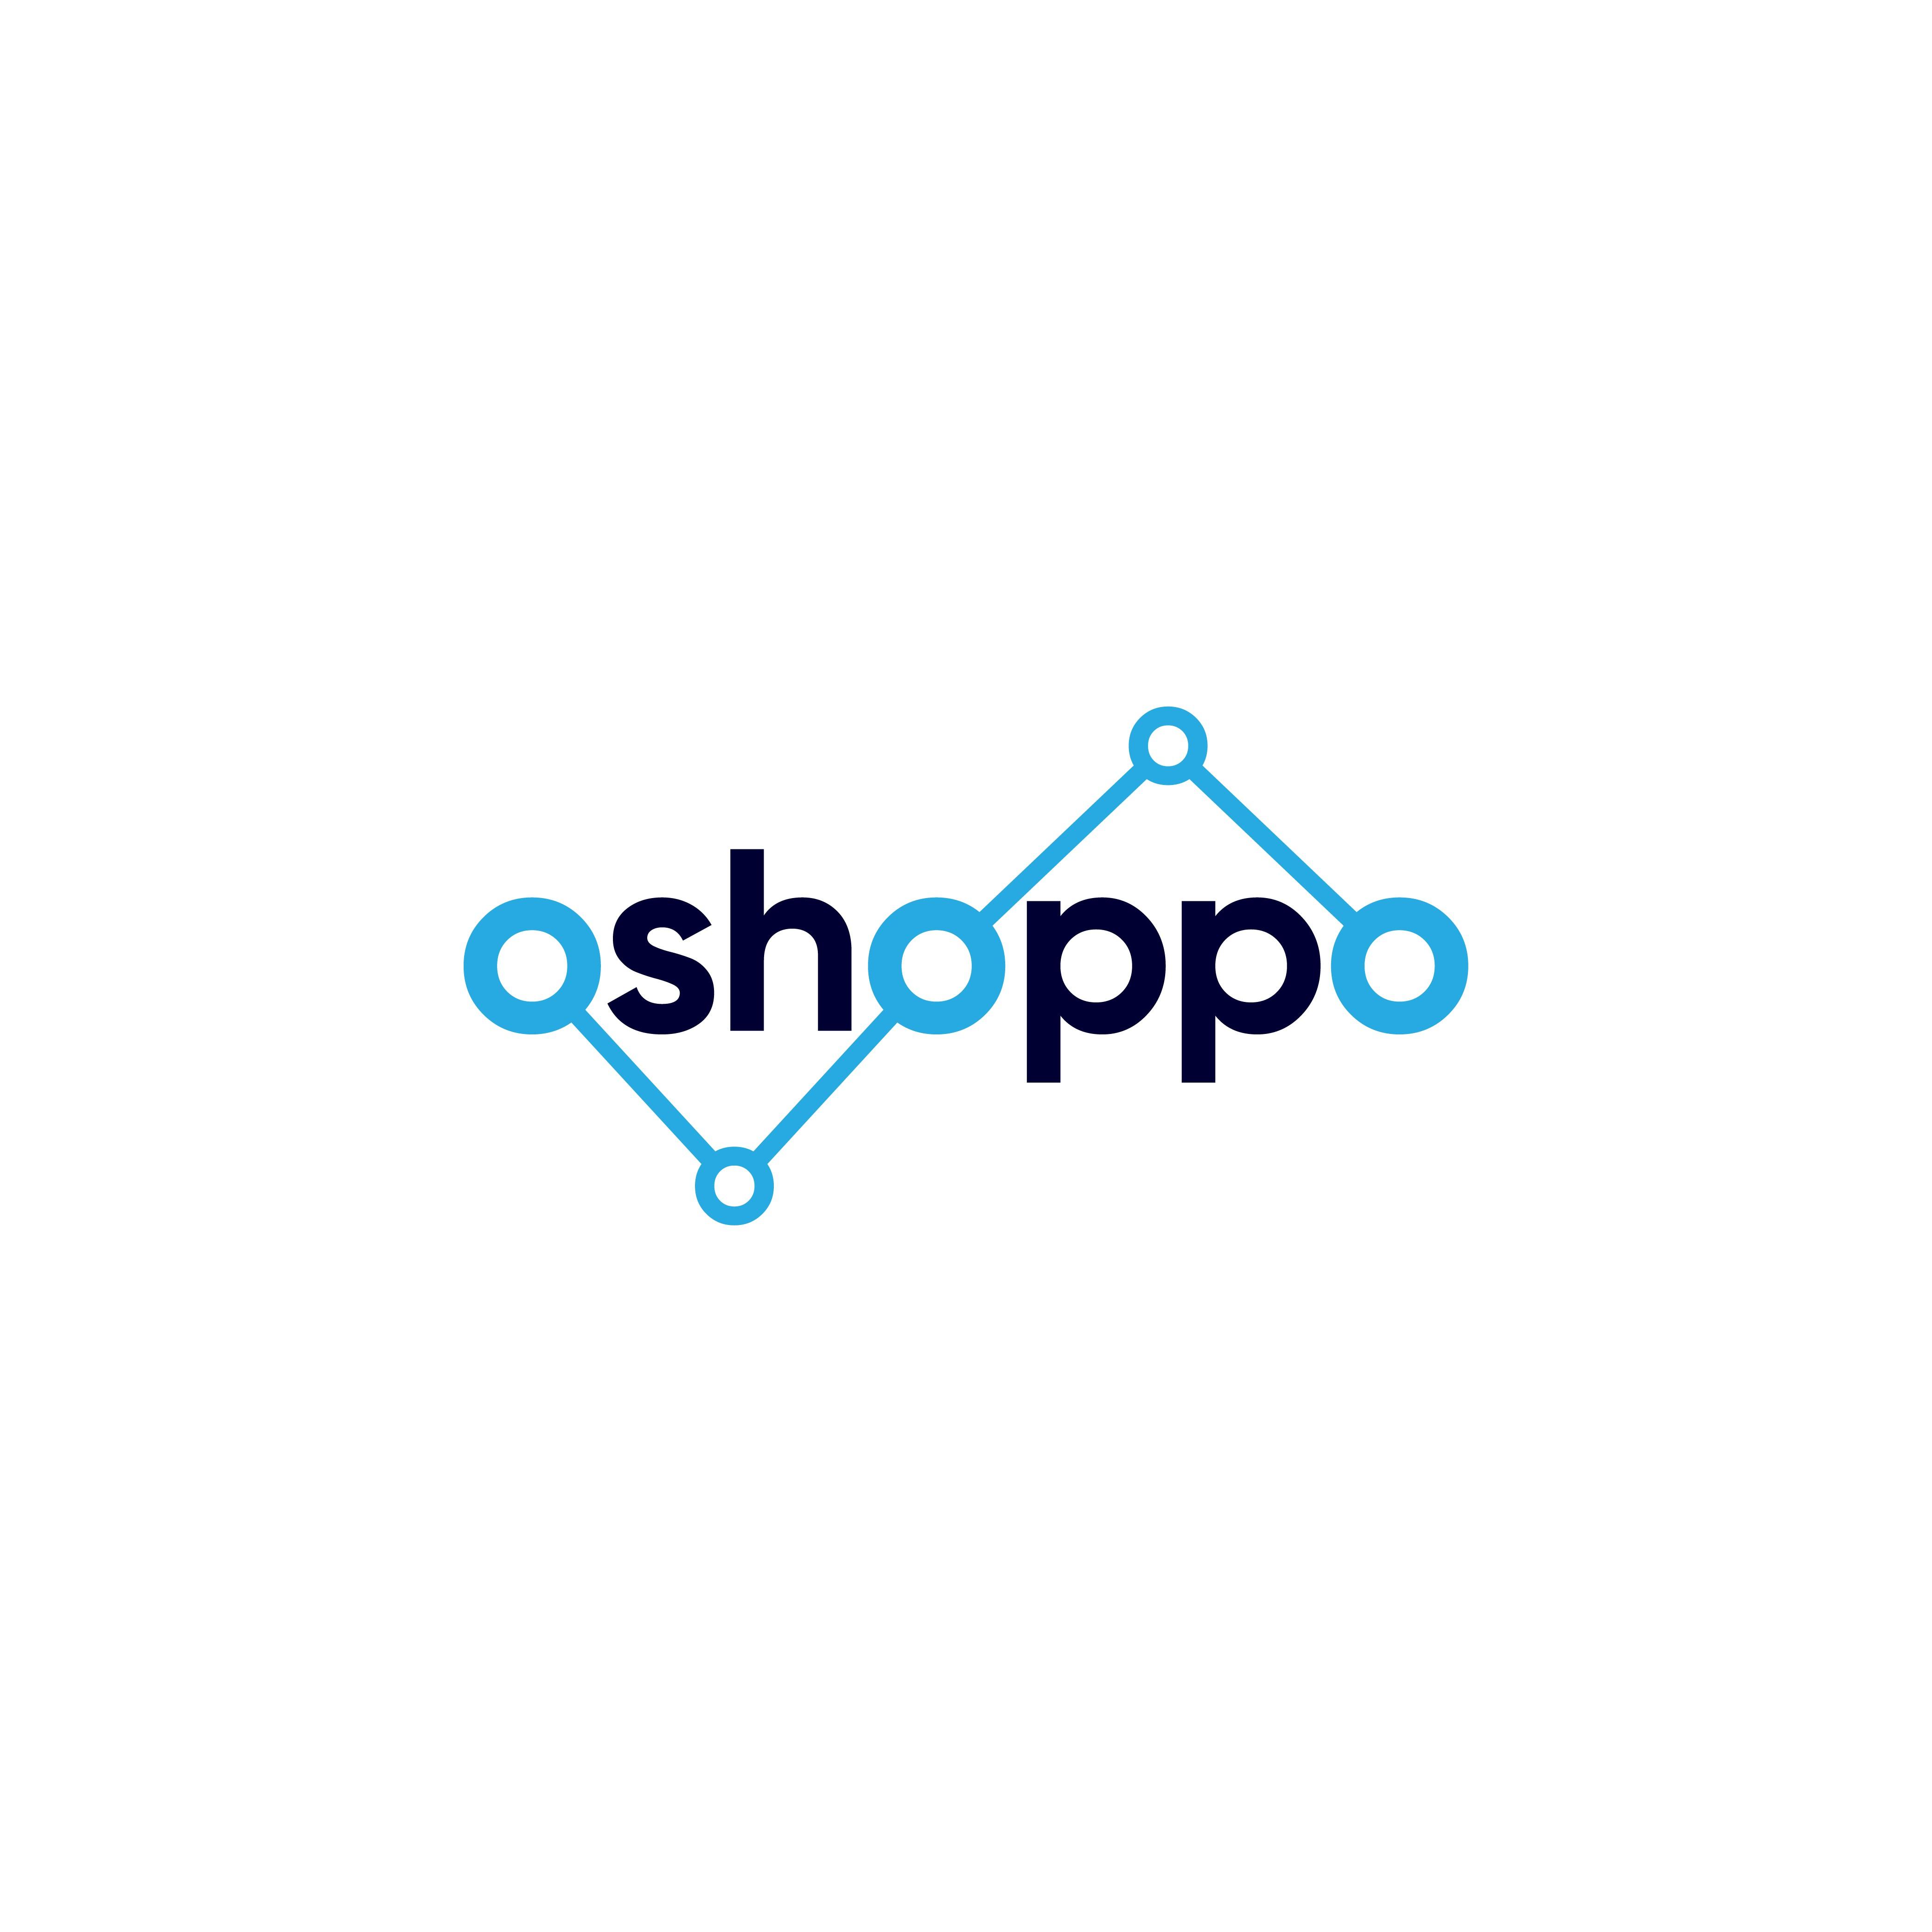 Logo for an online shopping network